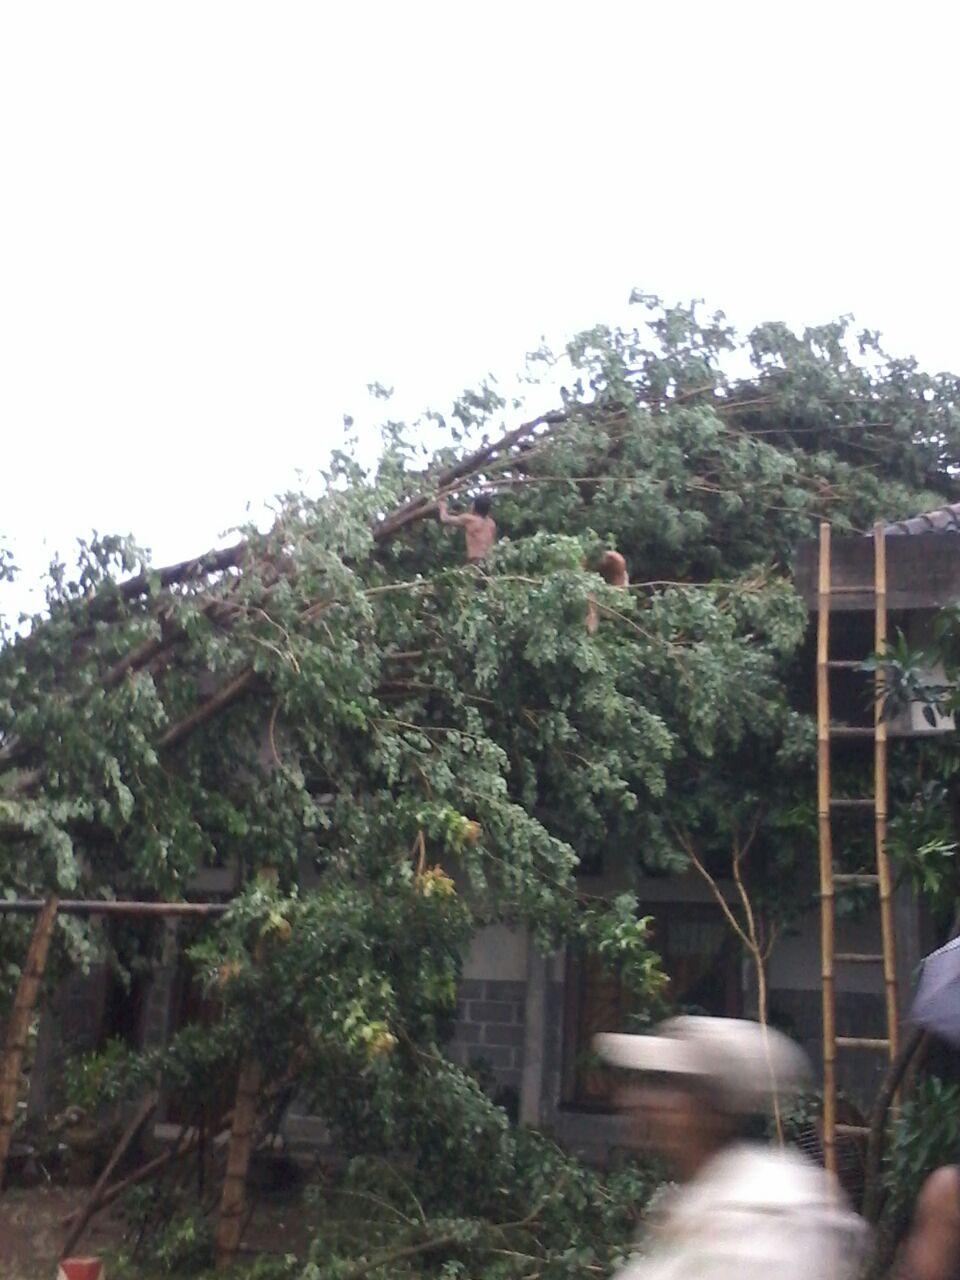 Kejadian Bencana Banjir Bandang Lombok Timur Ppkk Depkes Gallery Taman